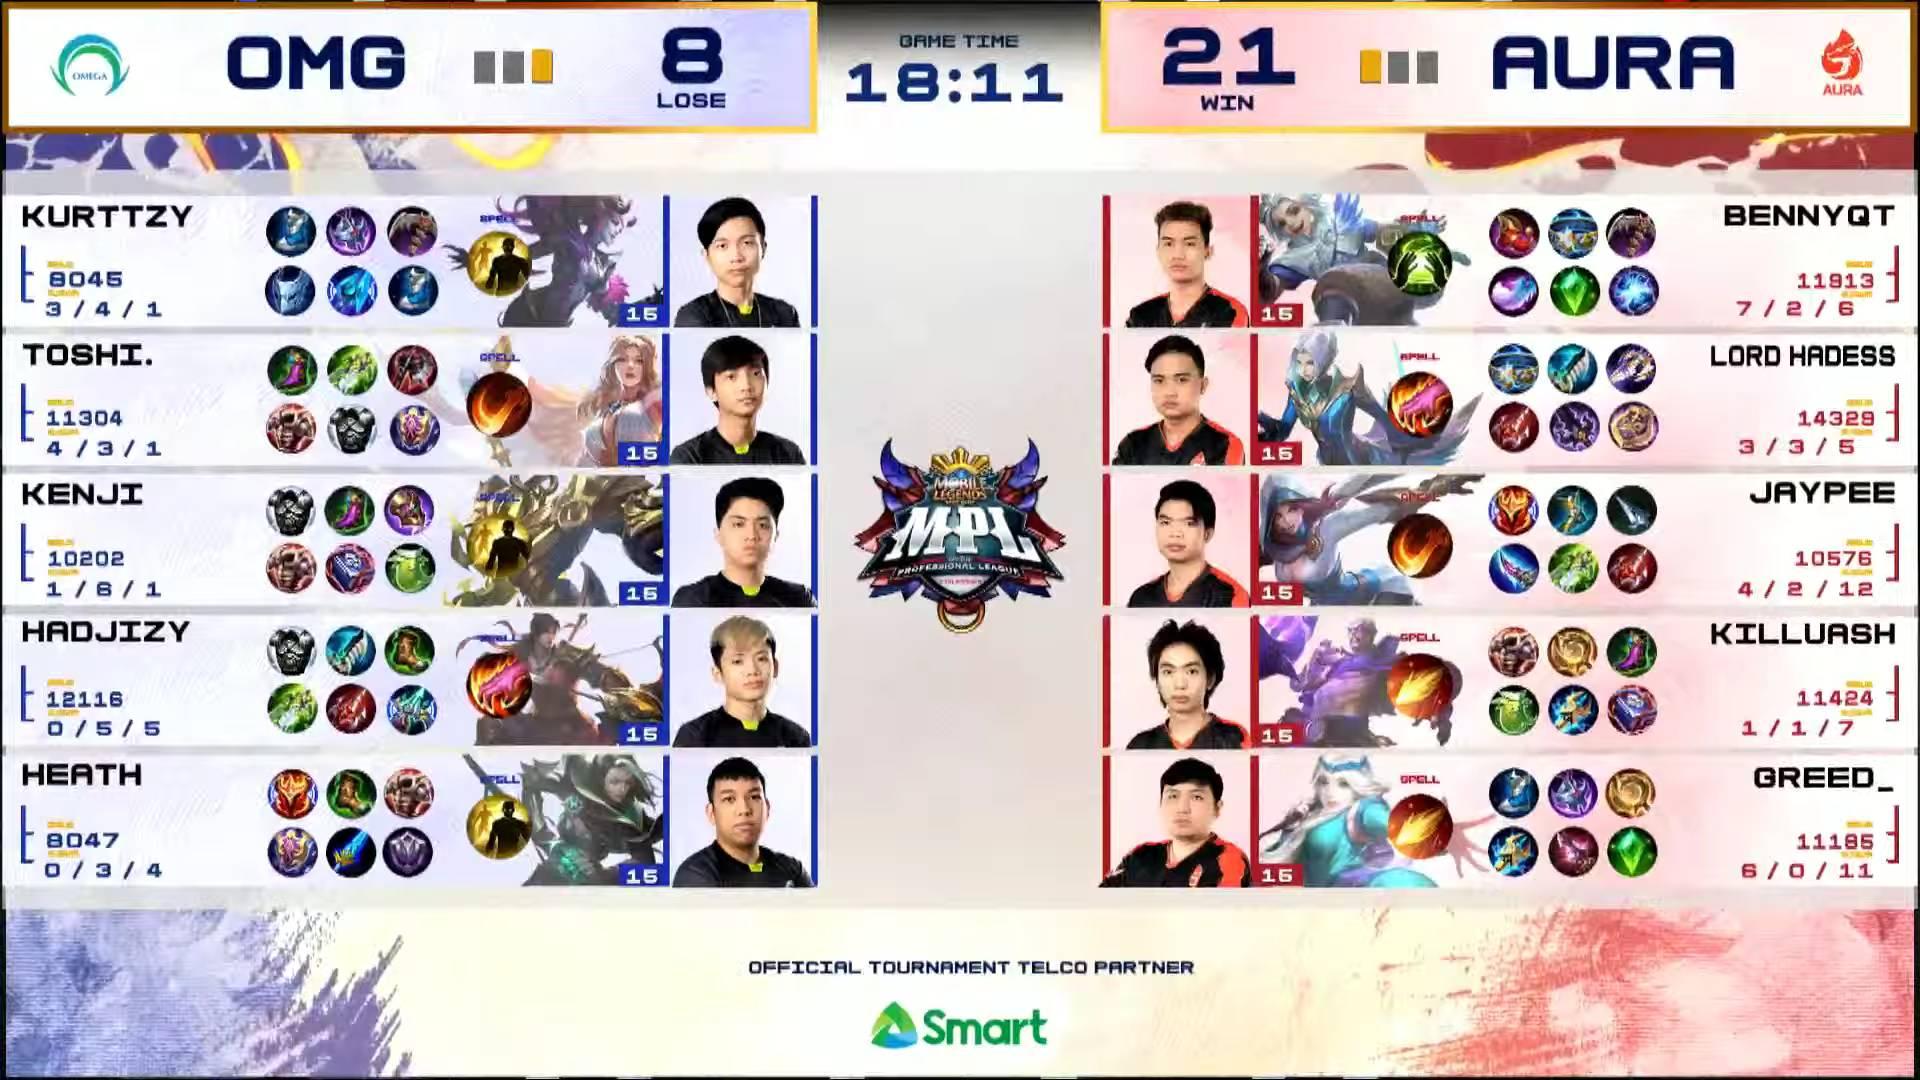 MPL-PH-Season-7-Lower-brack-Aura-def-Omega-Game-2 Bennyqt's Lunox rises as Aura PH outlasts Omega in marathon MPL playoffs match ESports Mobile Legends MPL-PH News  - philippine sports news